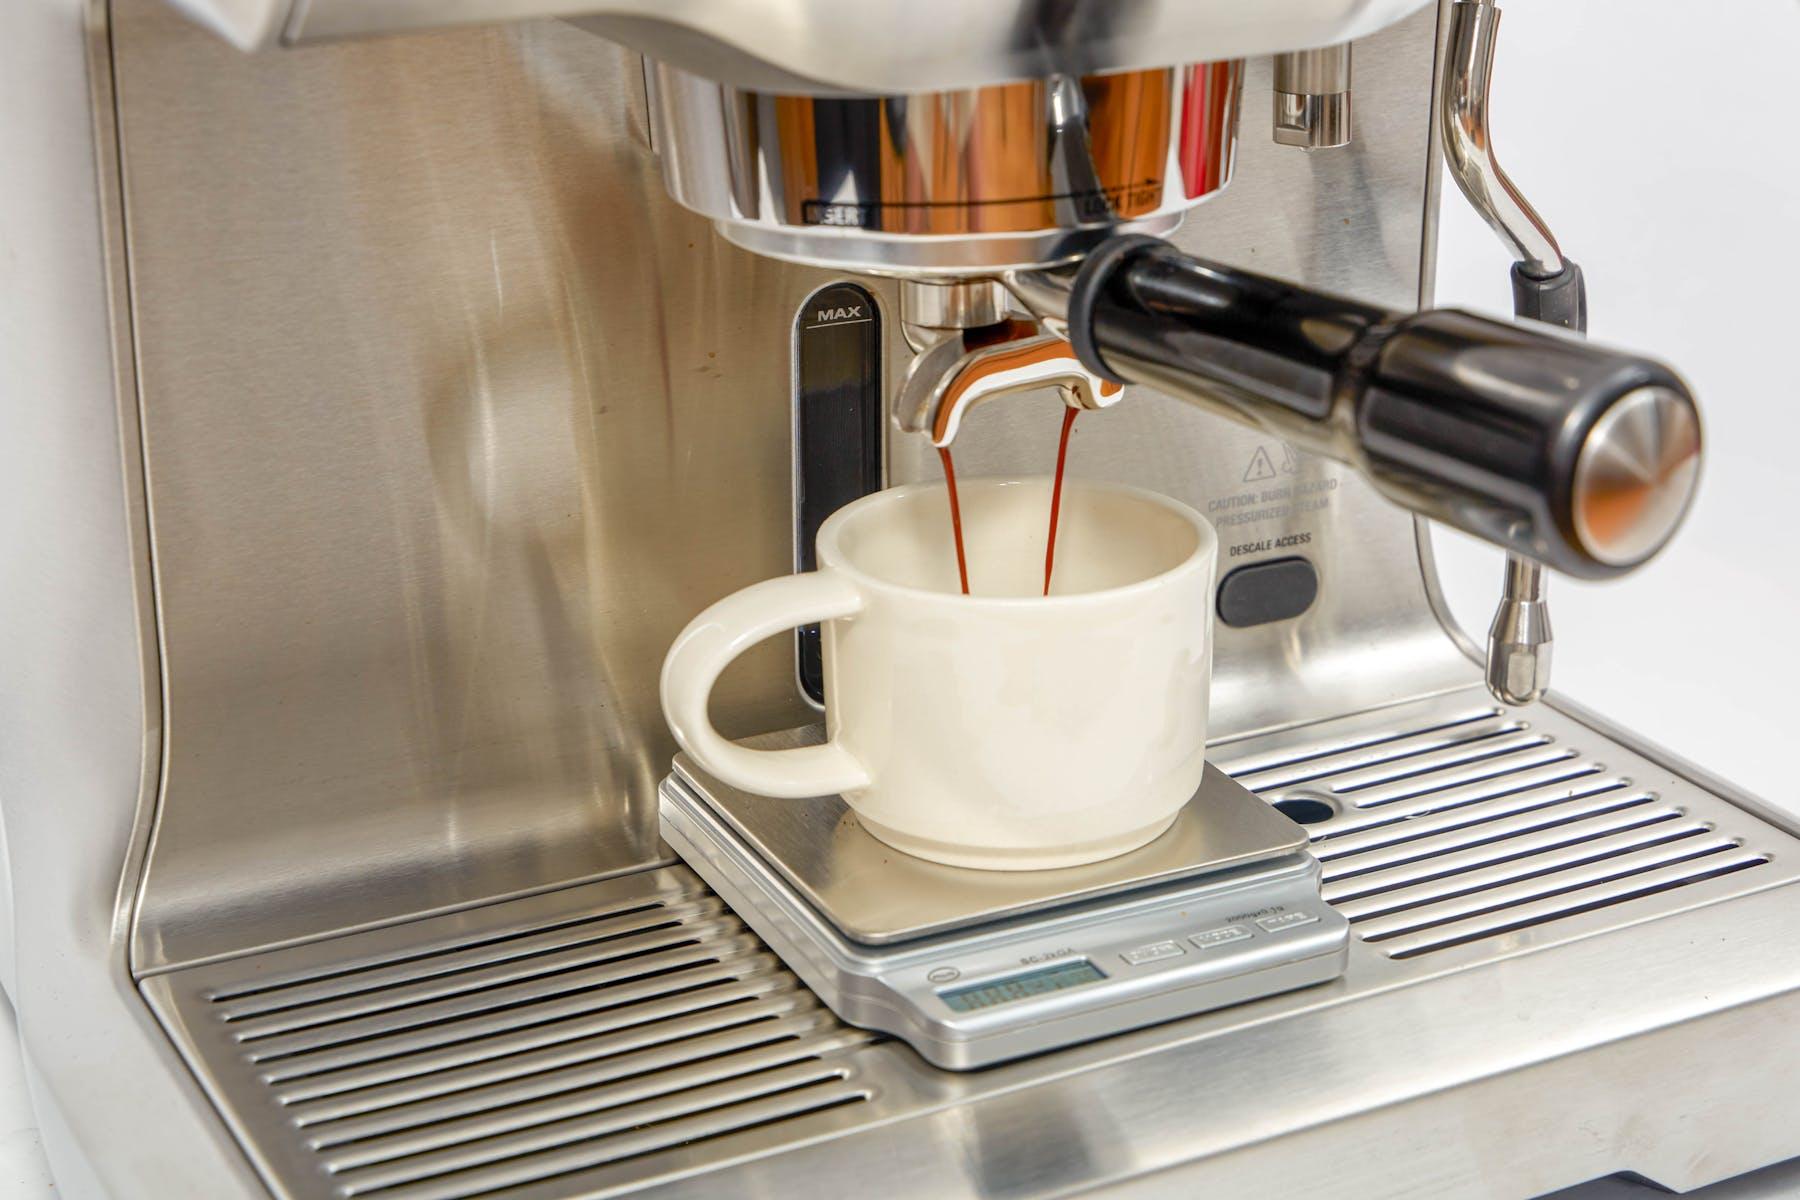 Pull a shot of espresso